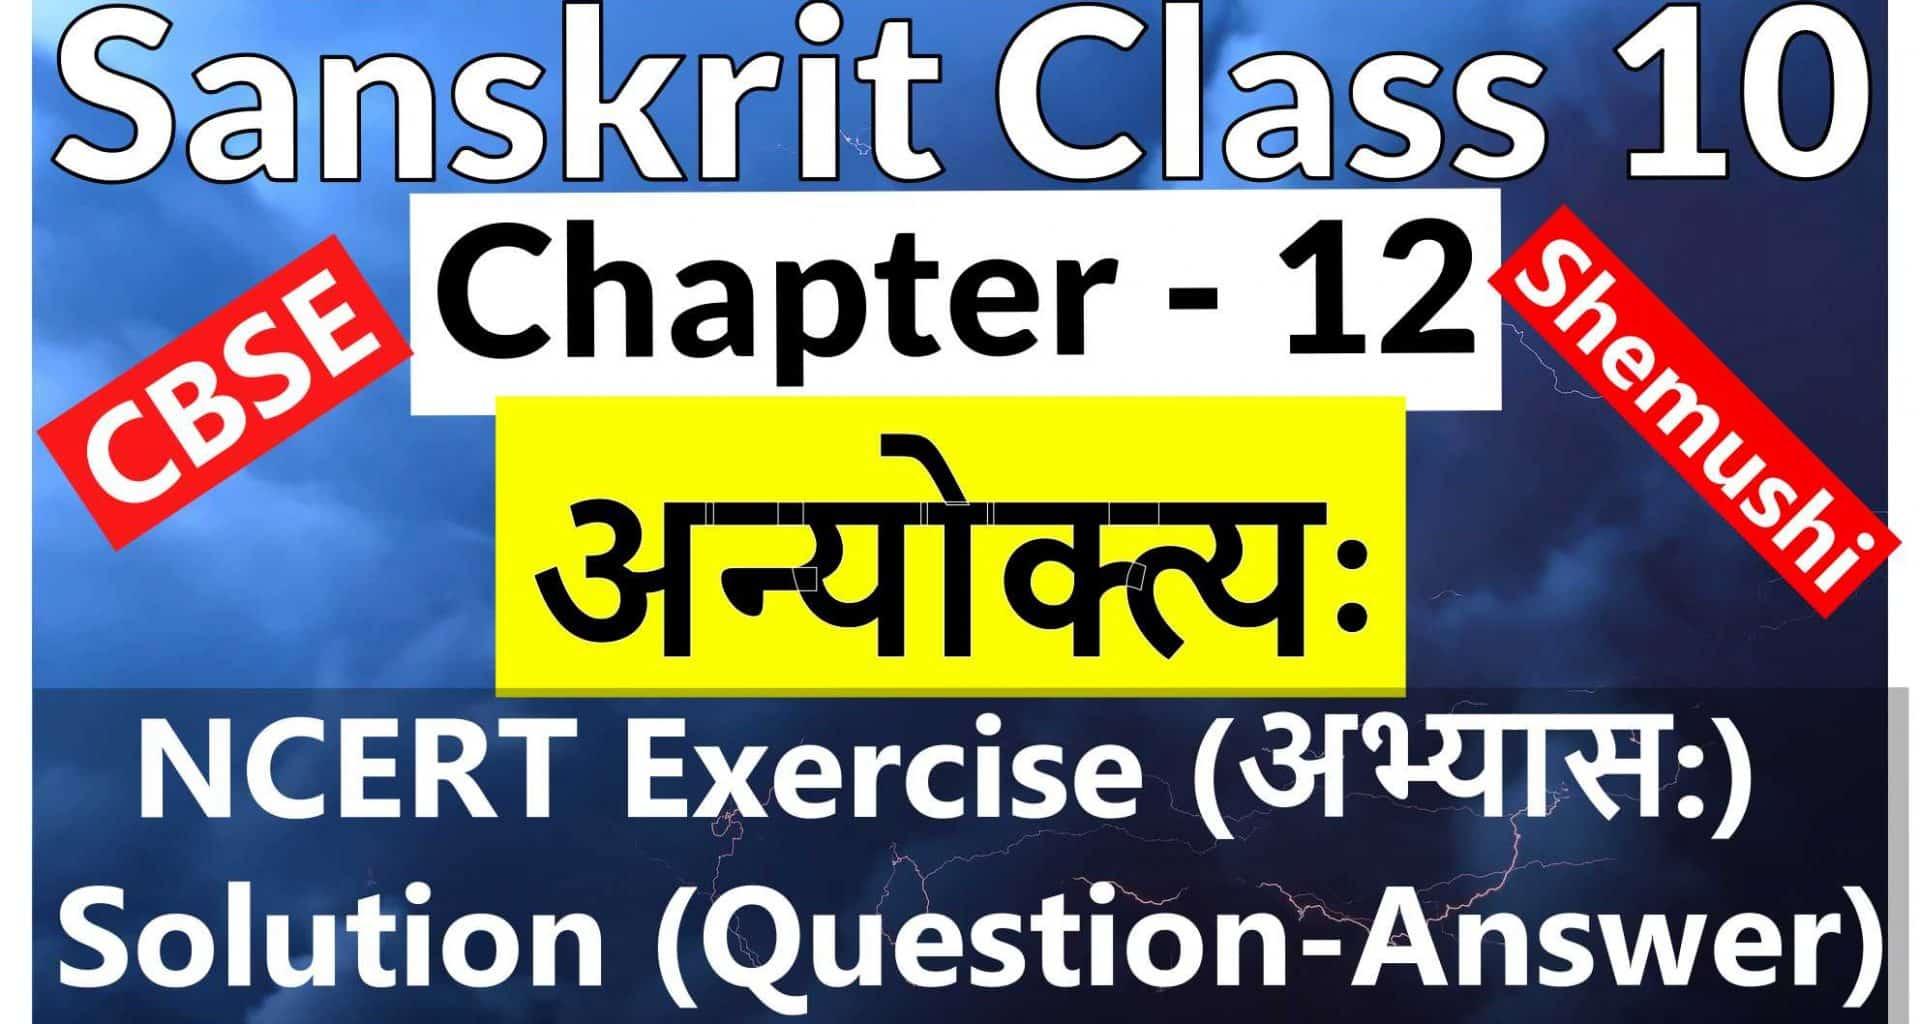 Sanskrit Class 10 - Chapter 12 - अन्योक्त्यः - NCERT Exercise Solution (Question-Answer)